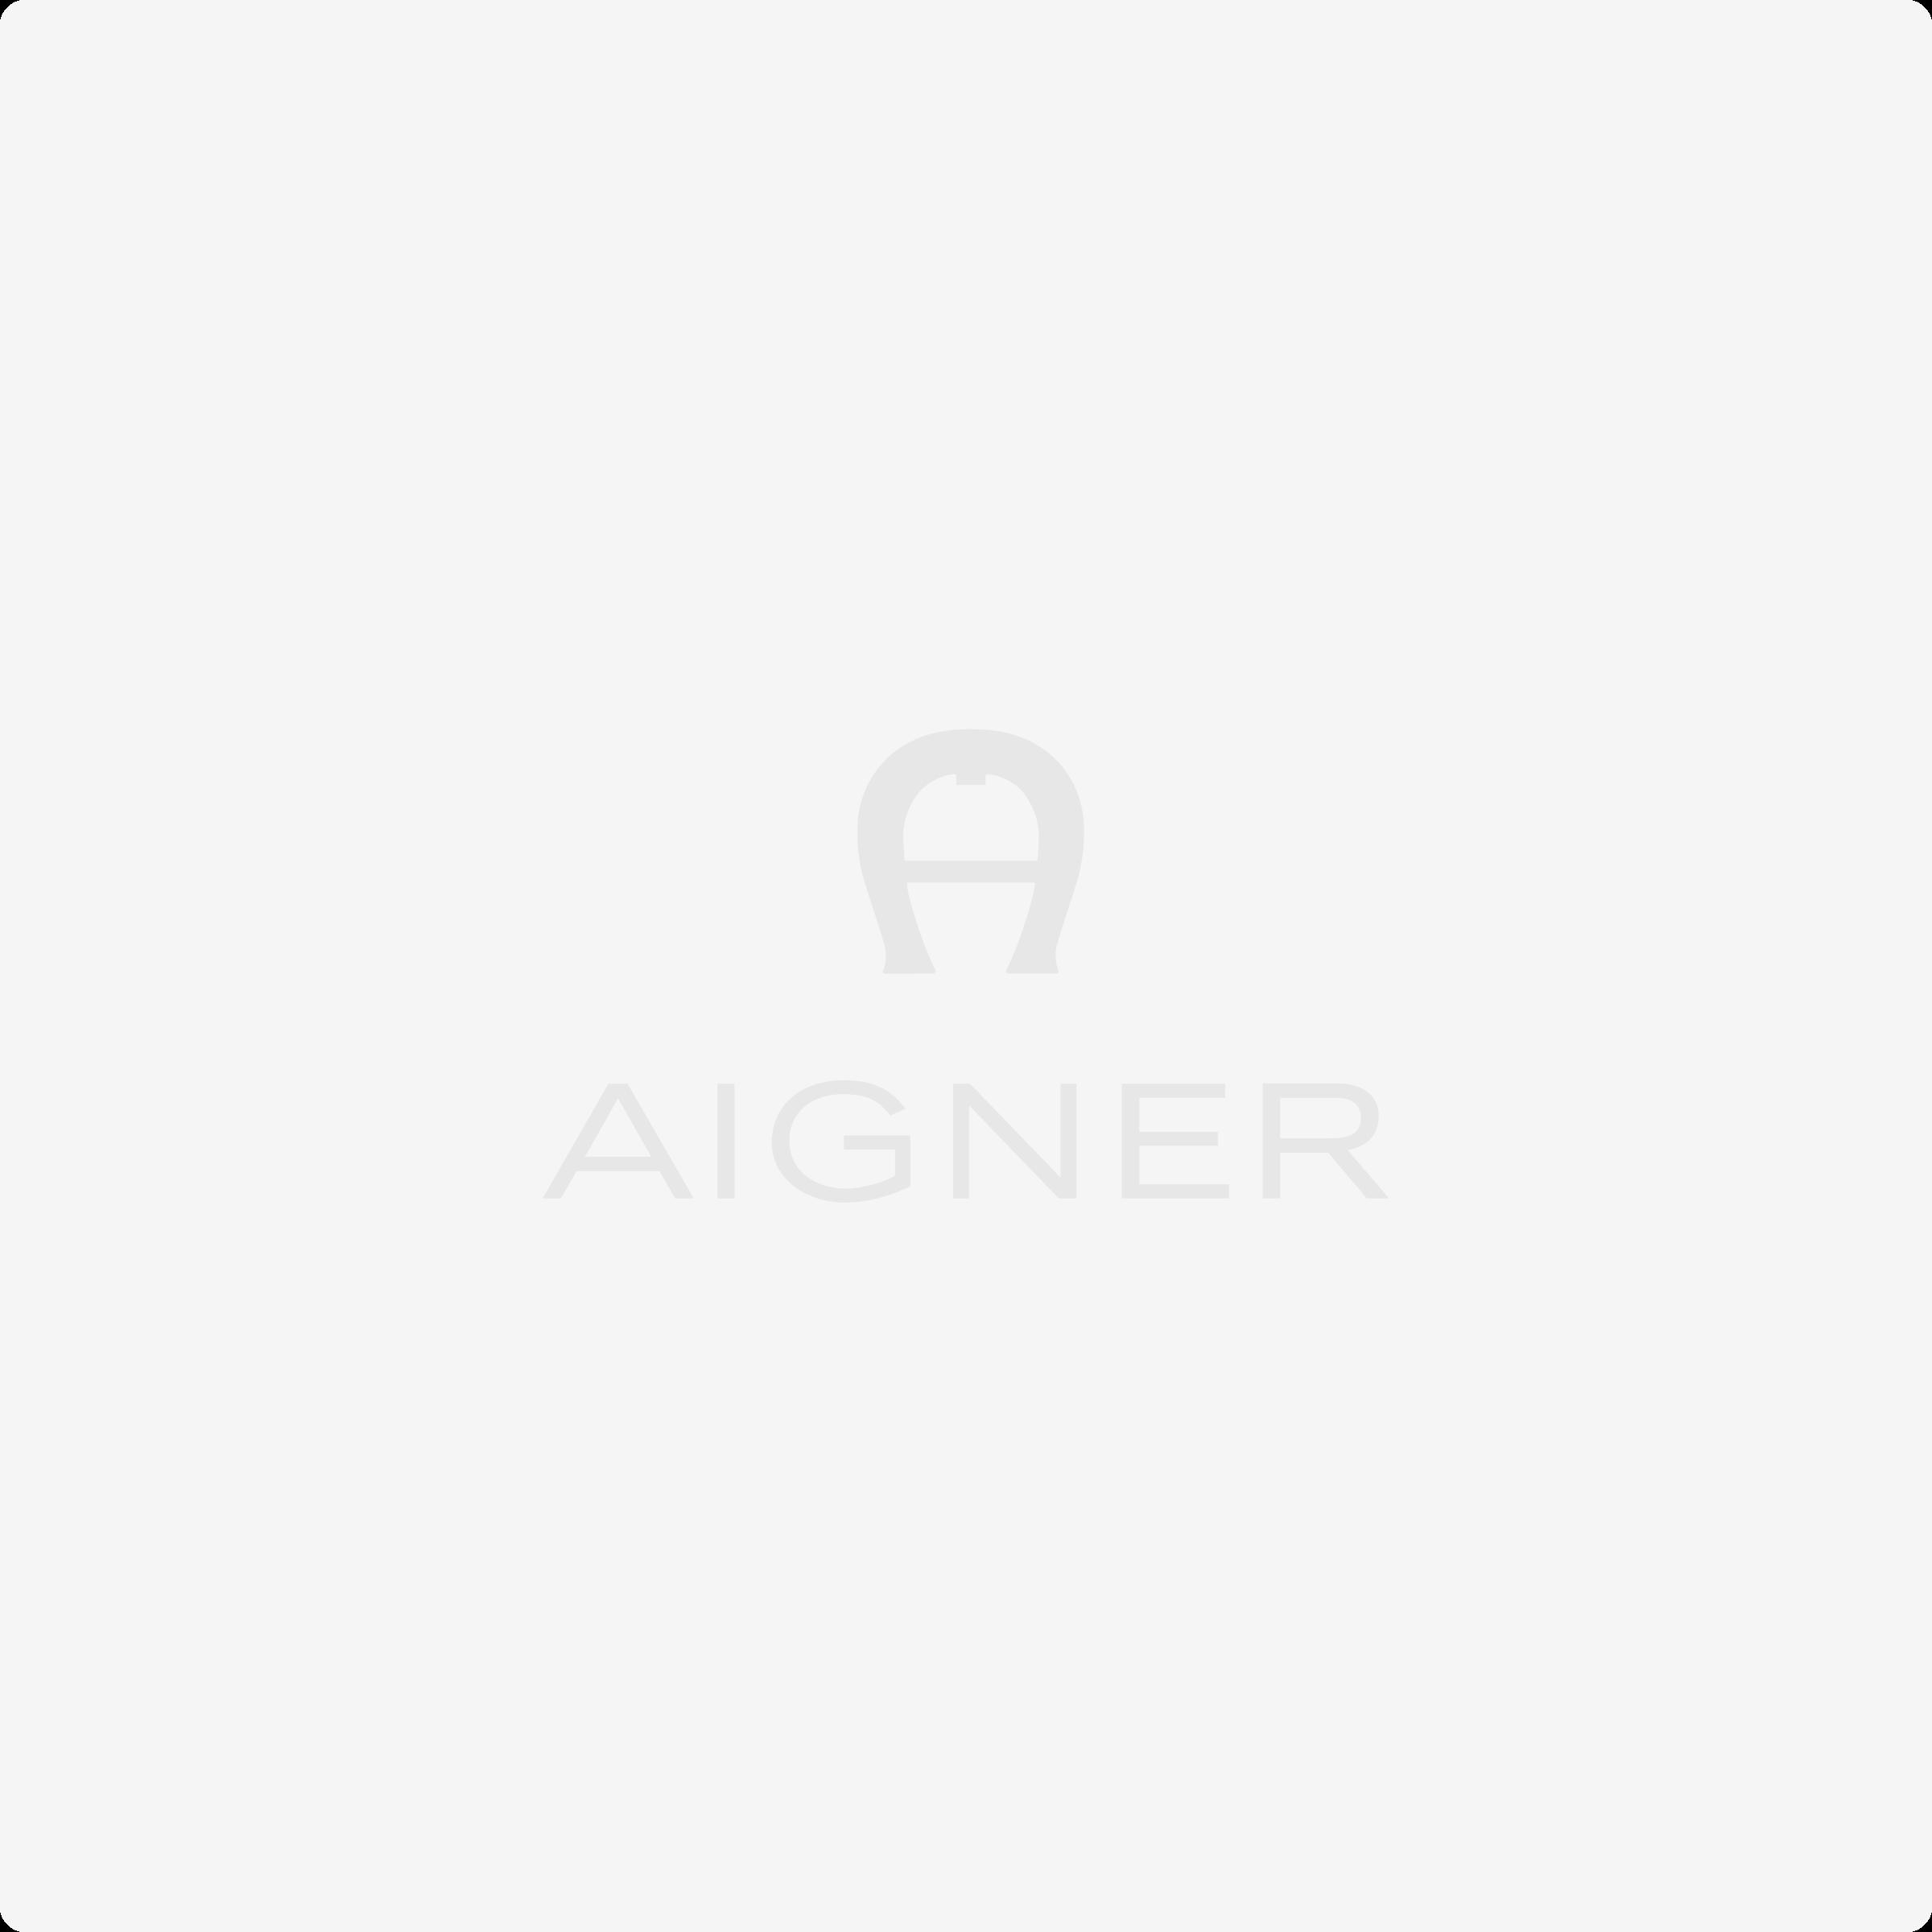 BASICS Bill and card case